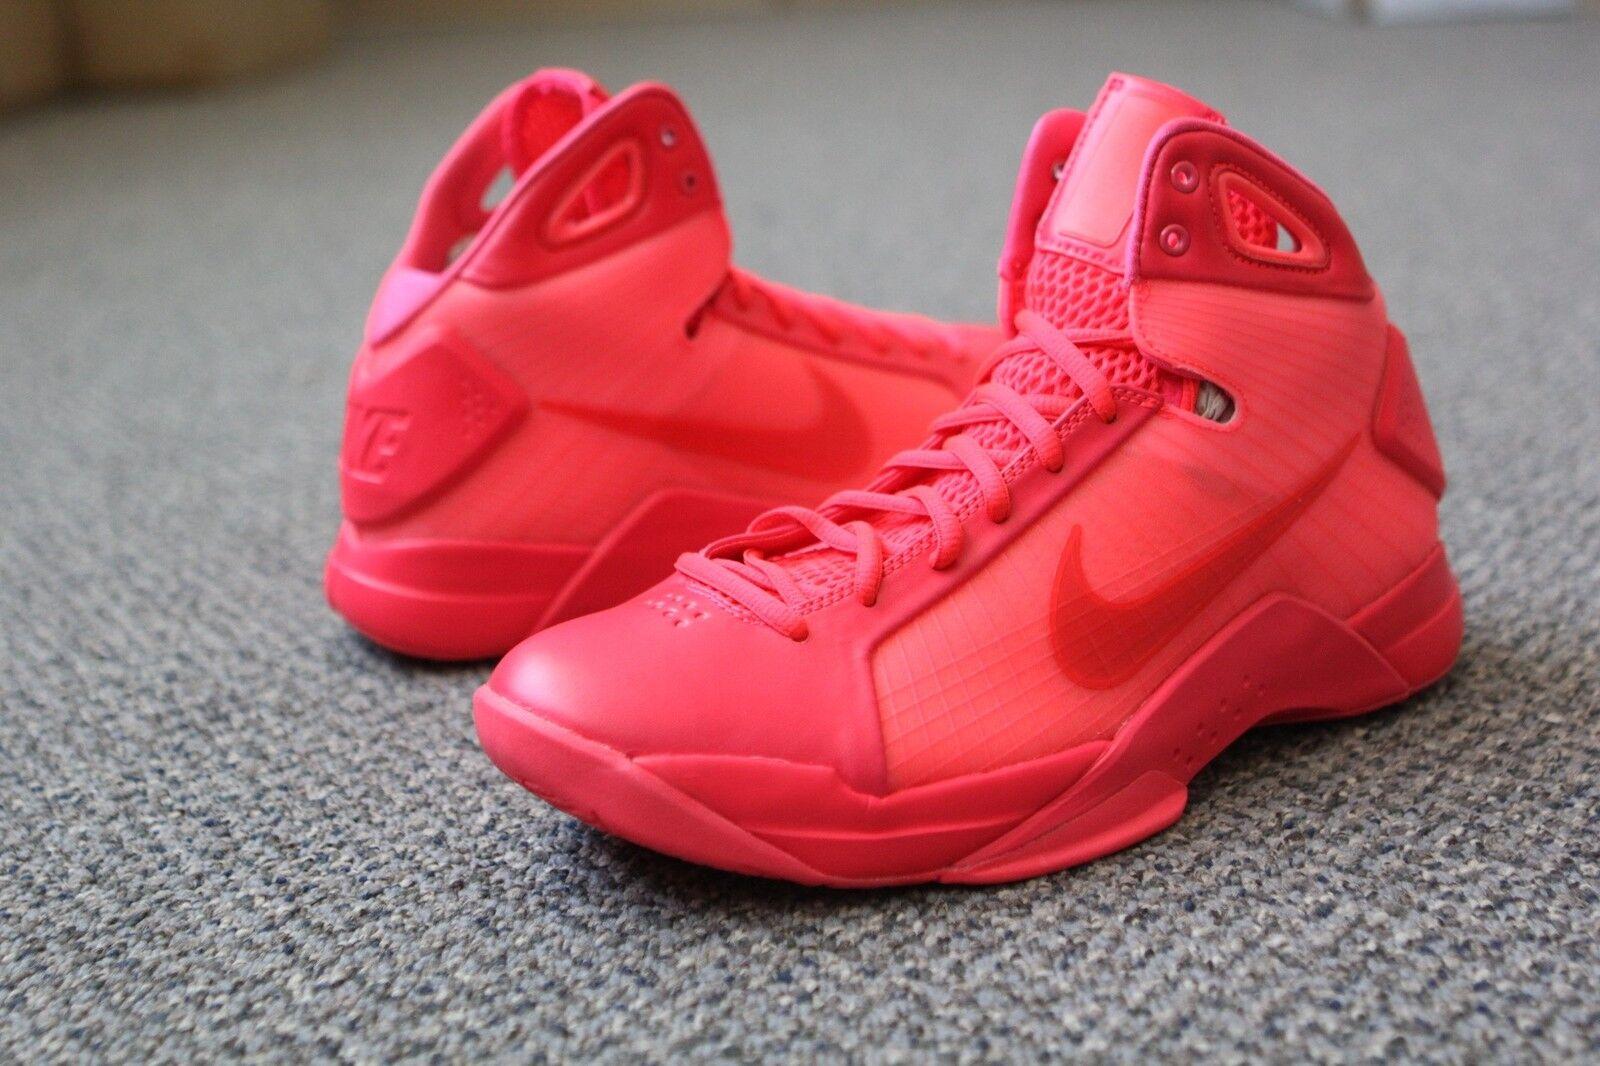 820321-600 Nike Men Hyperdunk Red '08 Solar Red Hyperdunk 8e96ec